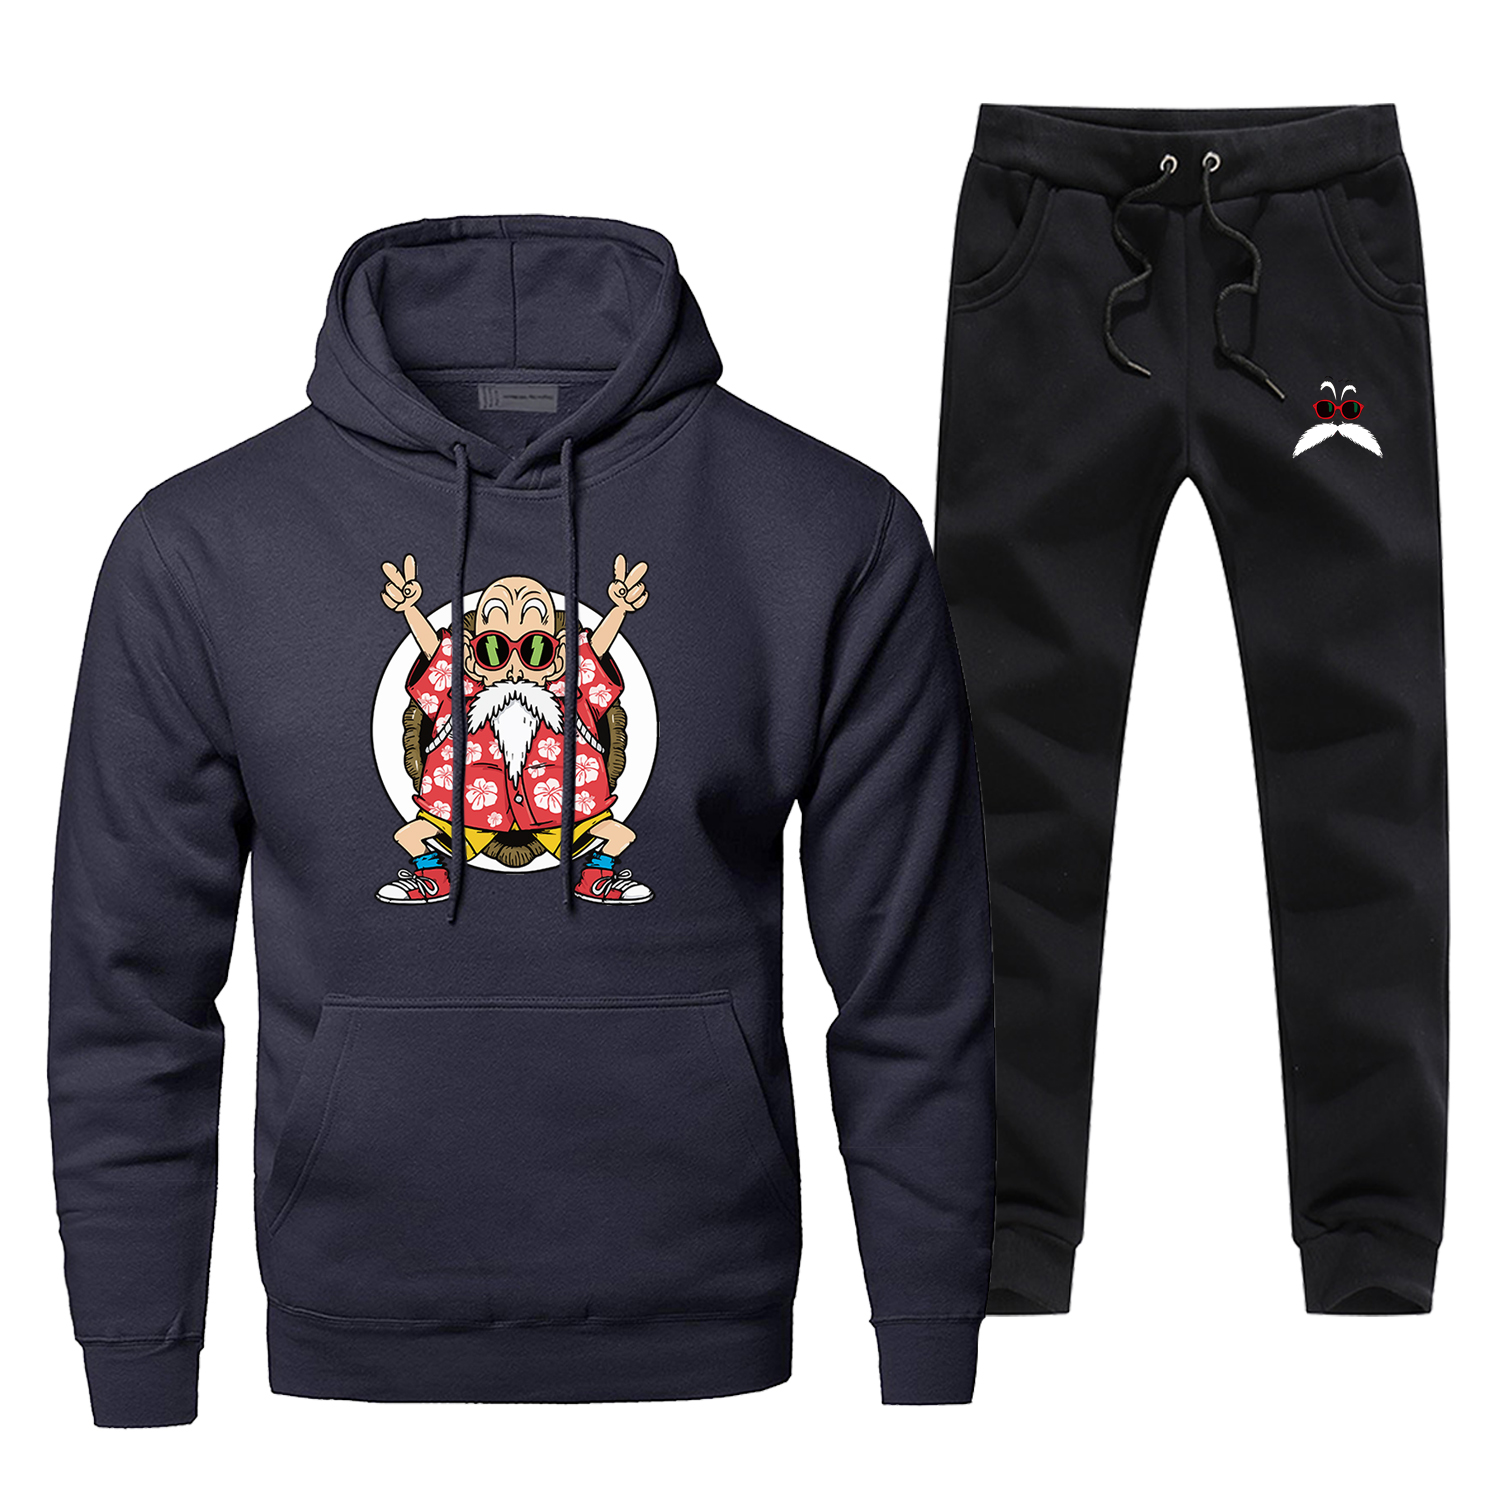 Japan Anime Dragon Ball 2 Piece Set Master Roshi Men's Sets Kame Sennin Harajuku Hoodies Sweatshirts Fleece Pants Chandal Hombre